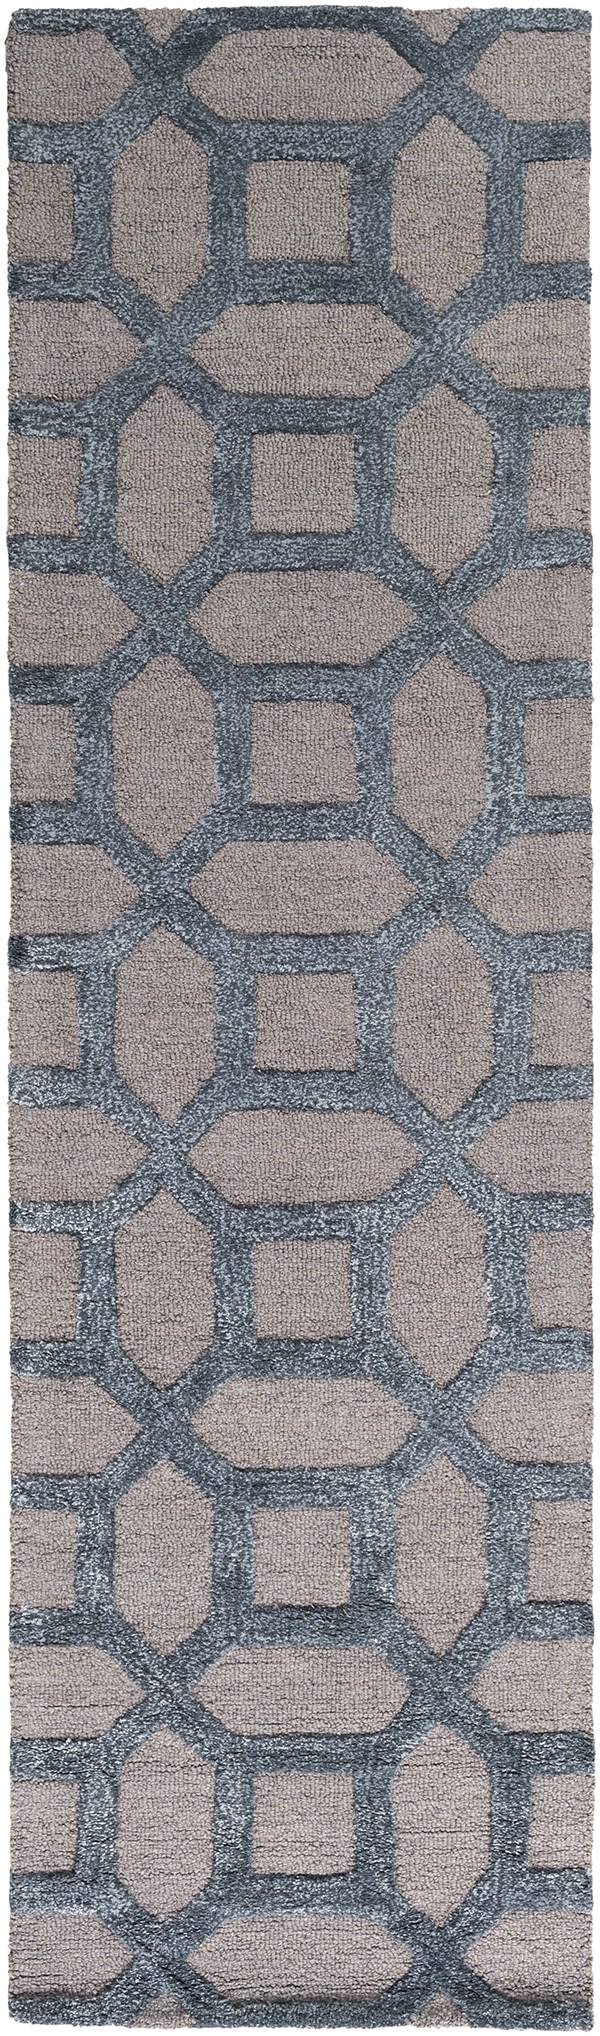 Light Grey, Blue (AWRS-2128) Moroccan Area Rug